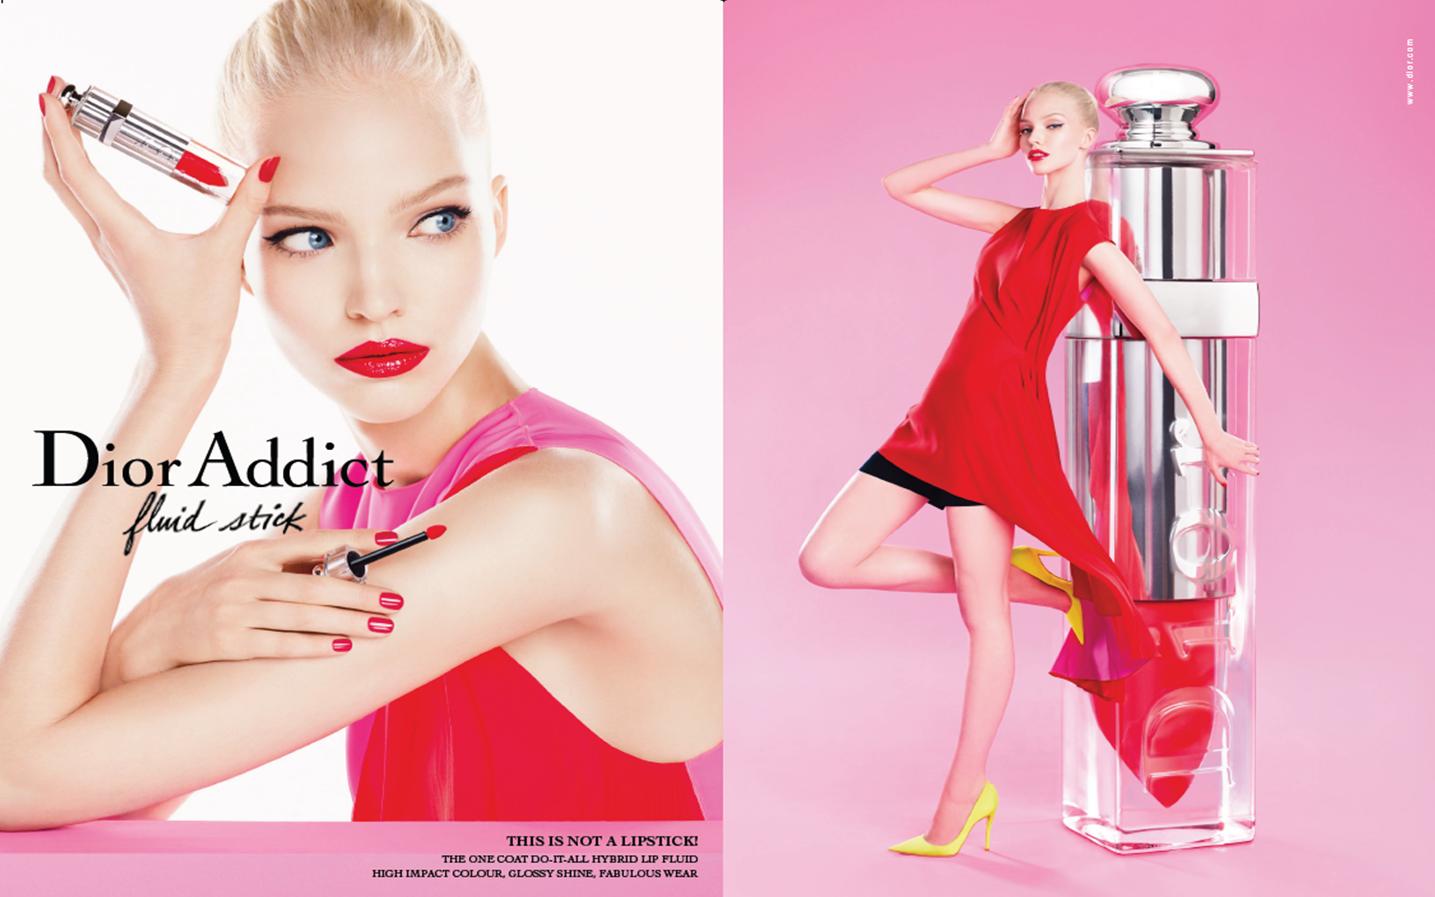 Dior-Addict-Fluid-Stick-DP.png (1435×897)